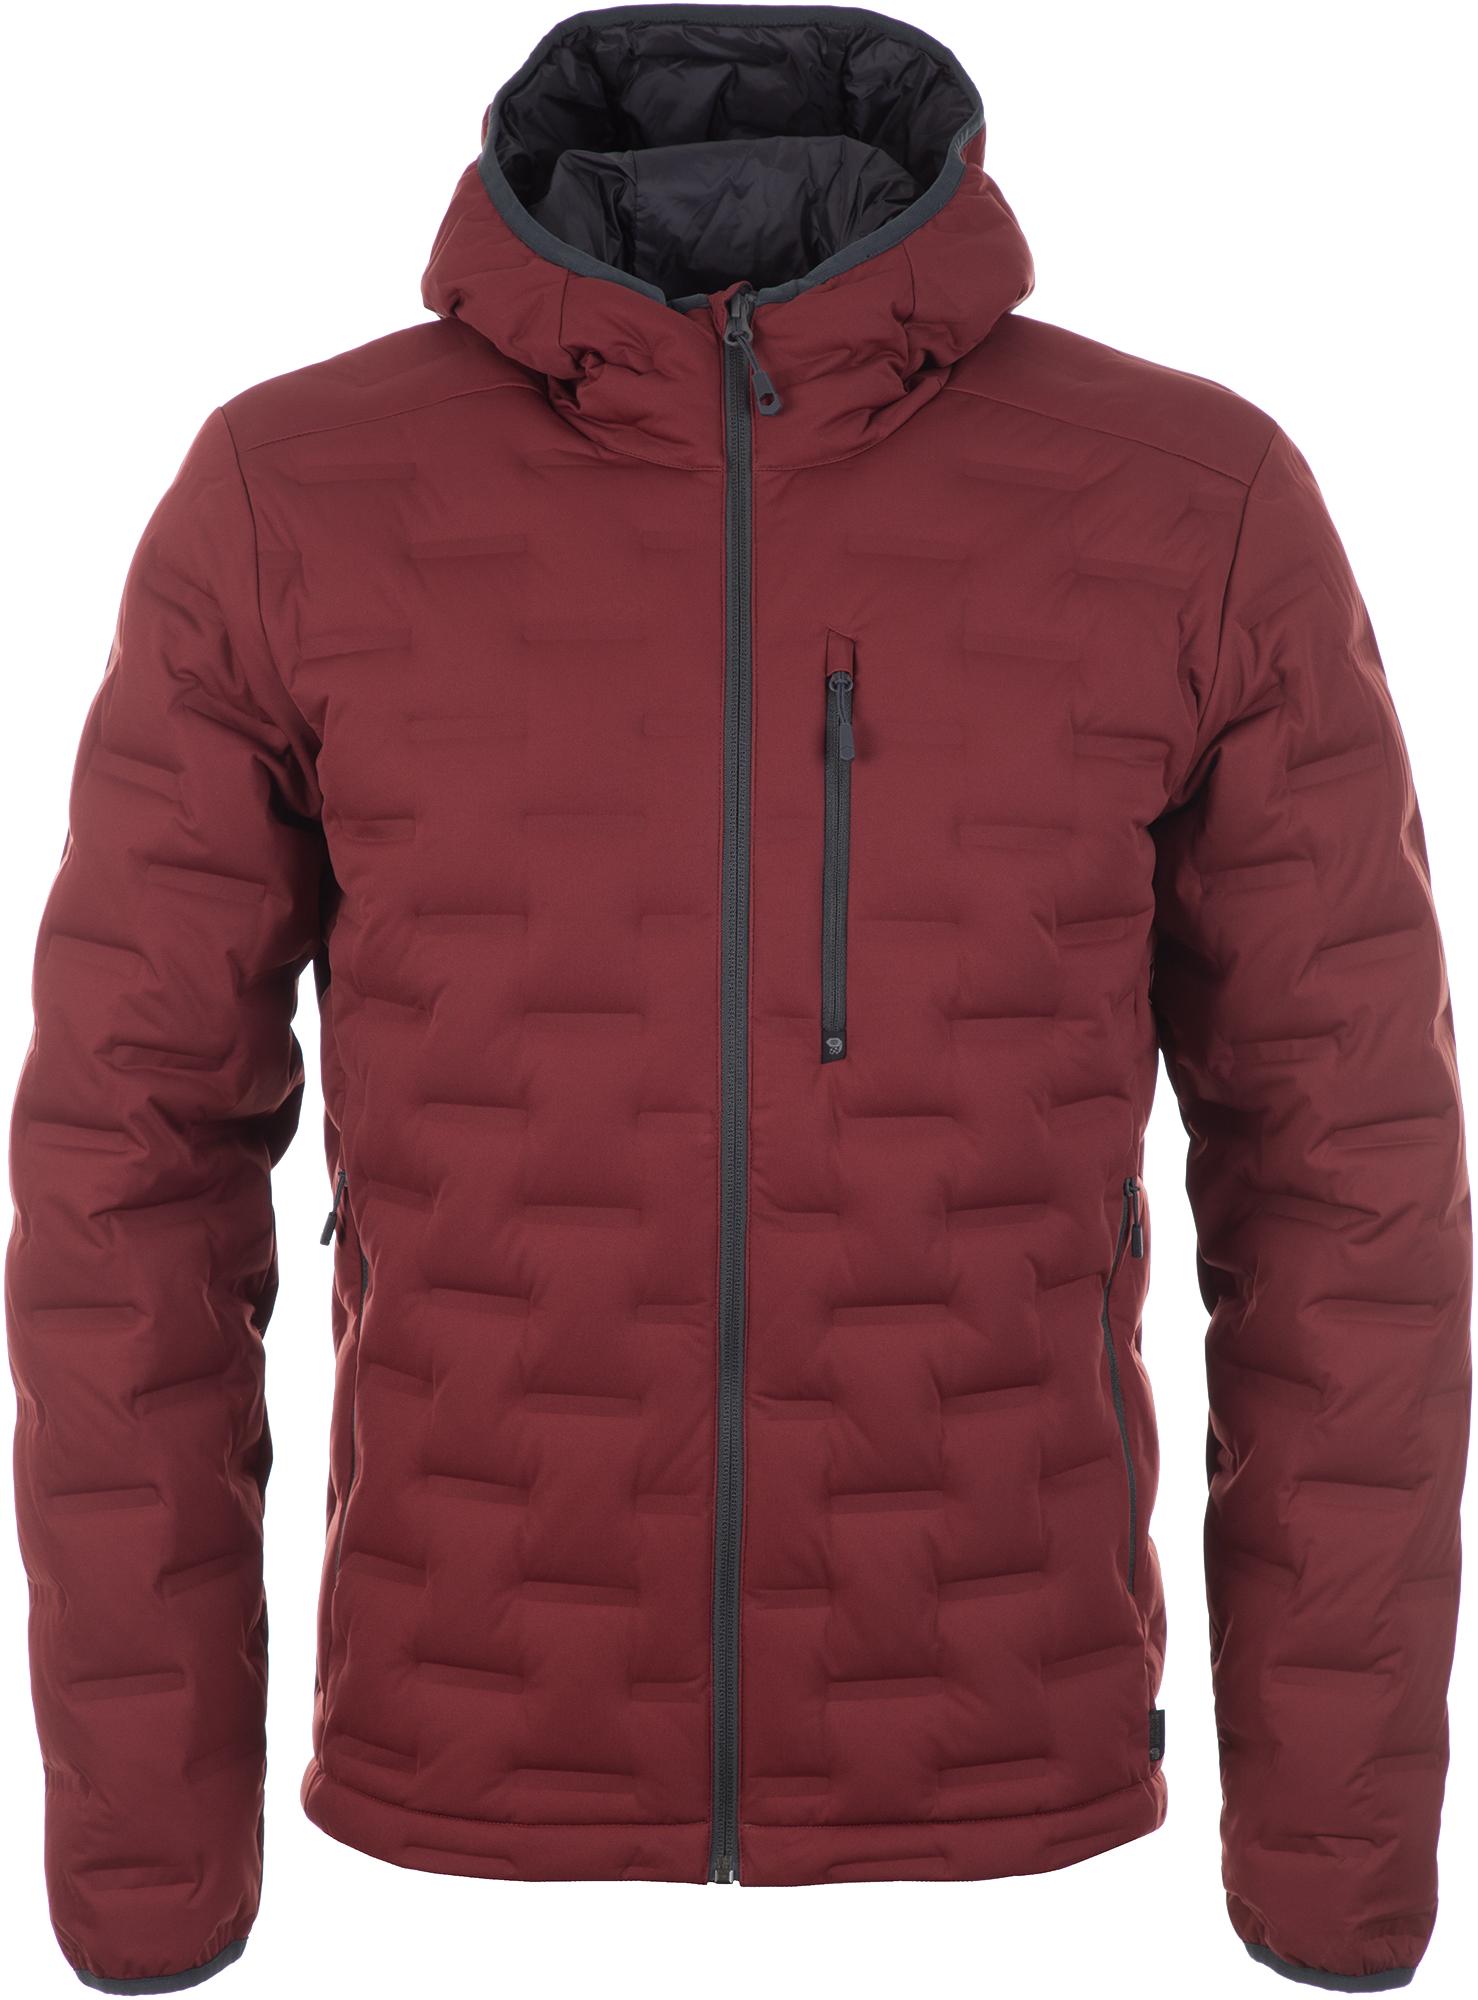 Mountain Hardwear Куртка пуховая мужская Mountain Hardwear Stretchdown, размер 56 цена